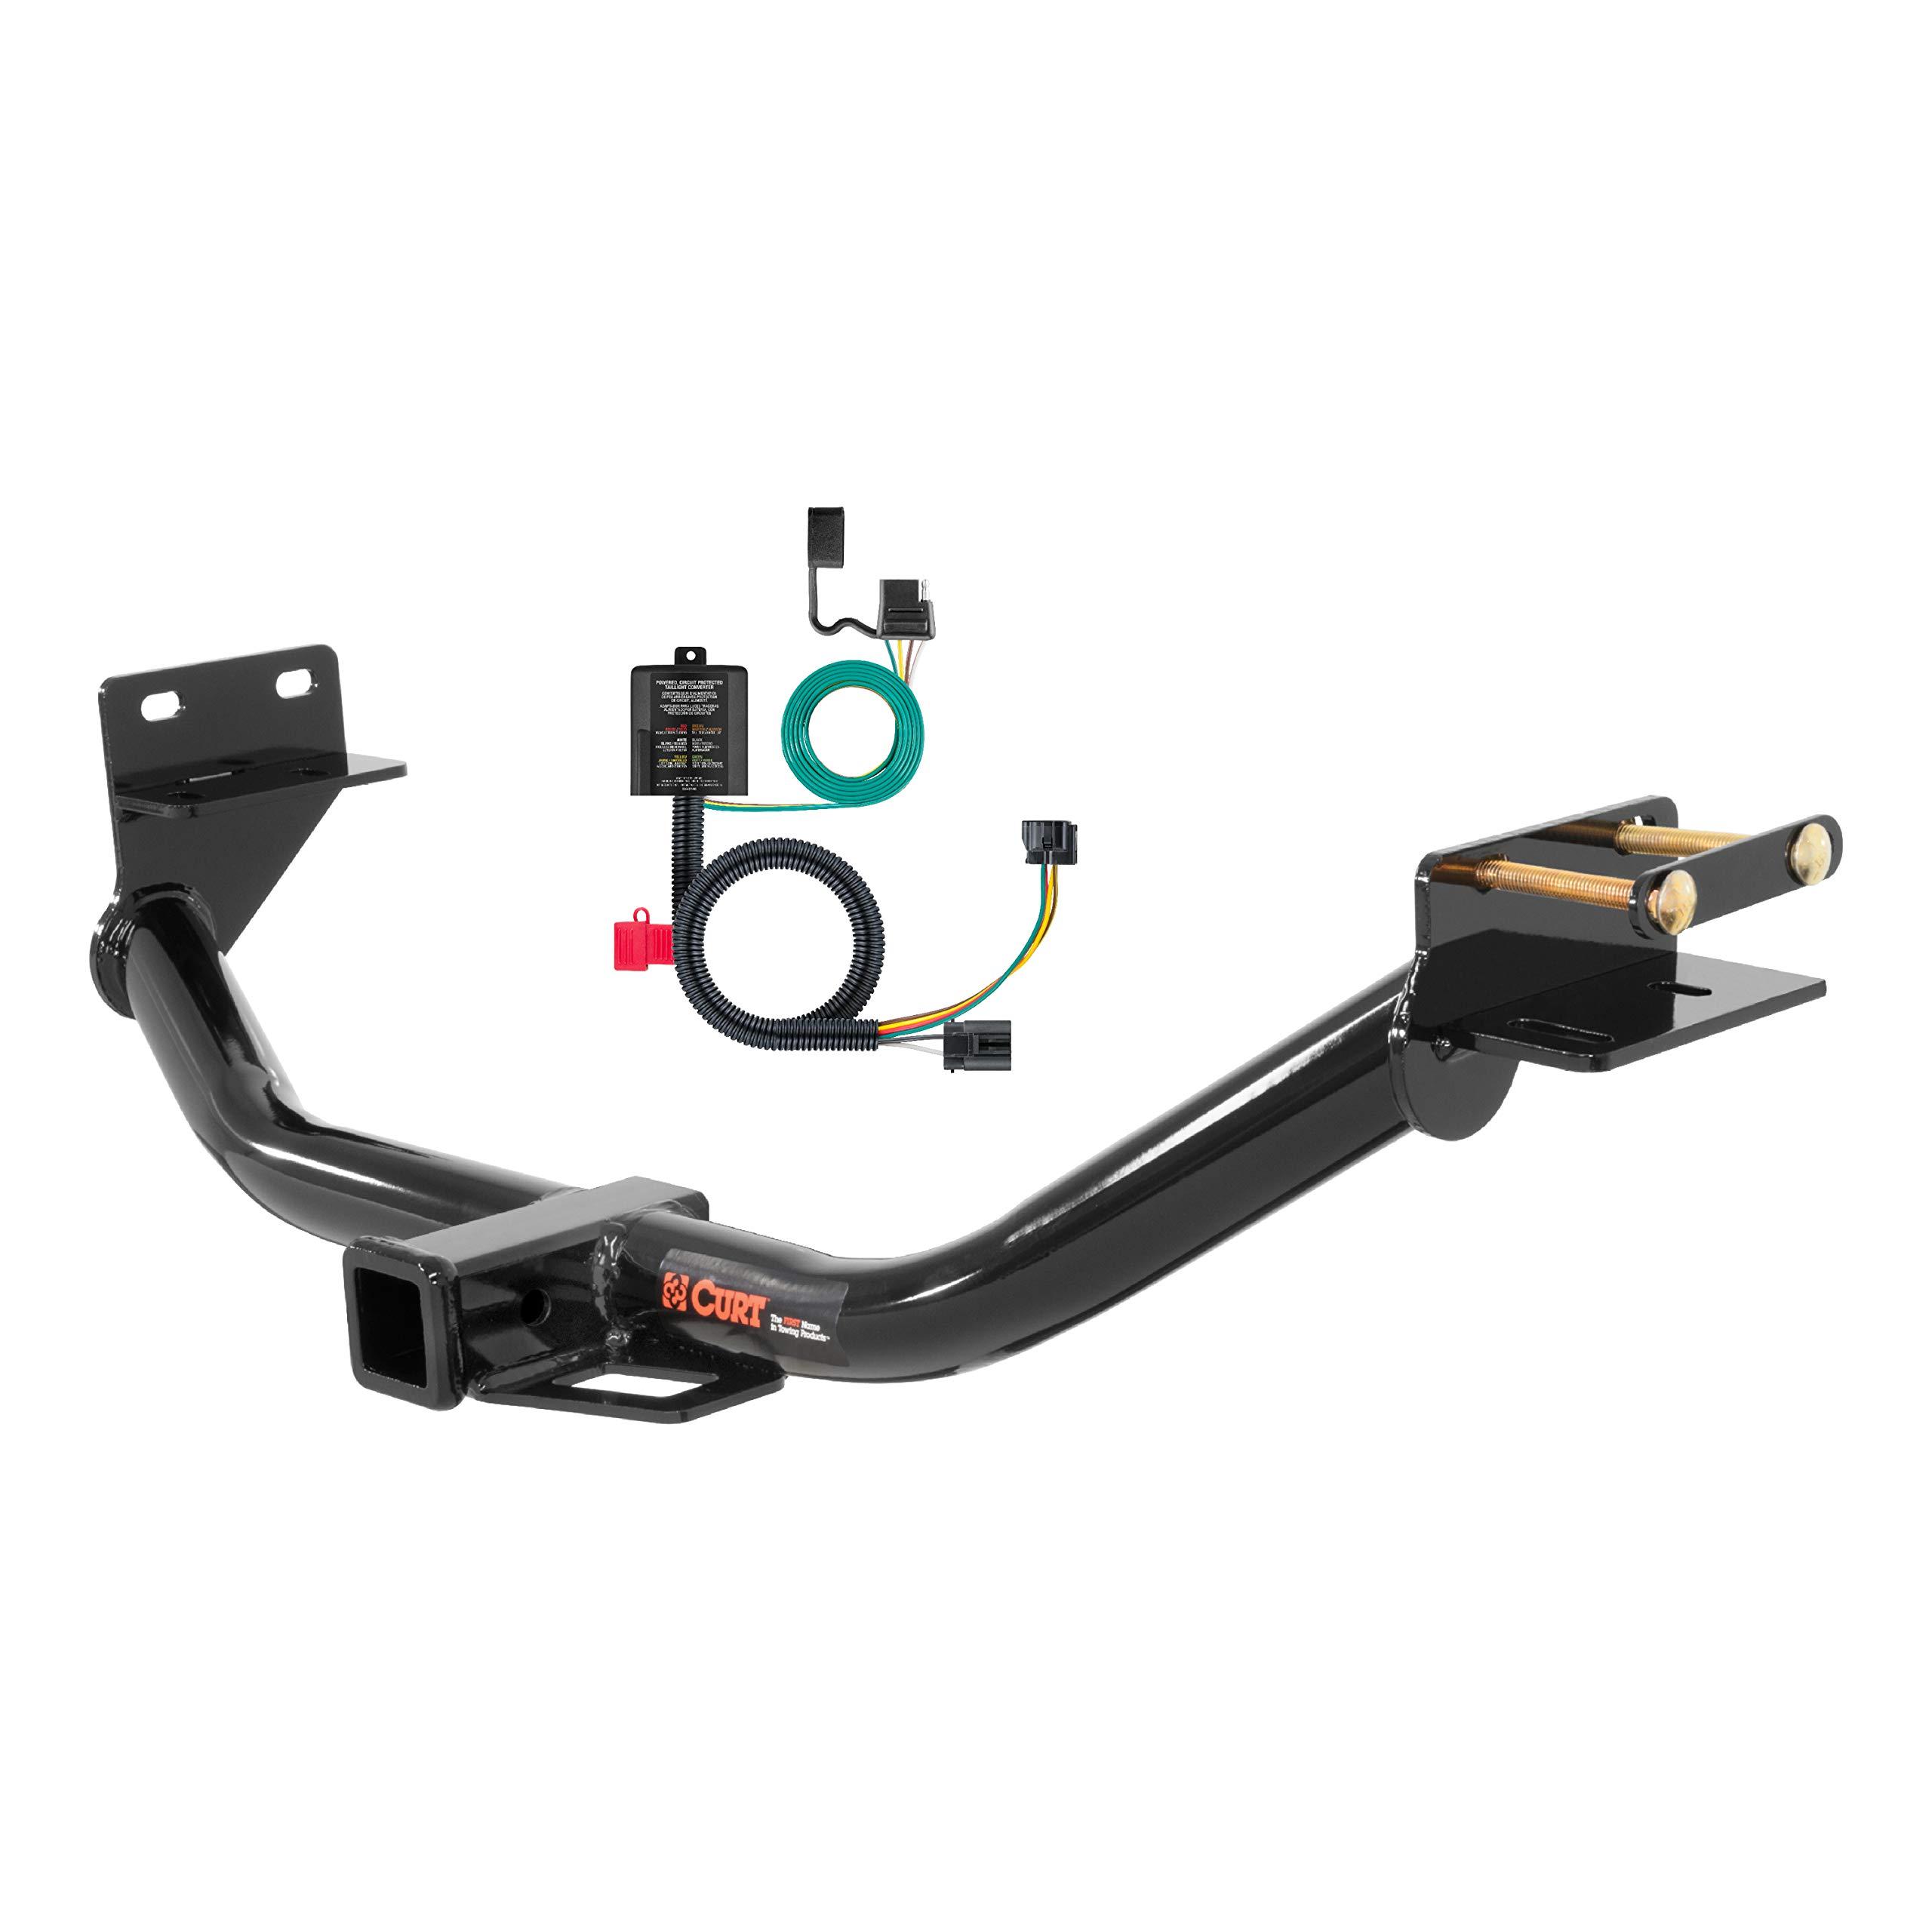 CURT 99314 Class 3 Trailer Hitch, 2-Inch Receiver, 4-Pin Wiring Harness Select Kia Sorento, Hyundai Santa Fe by CURT